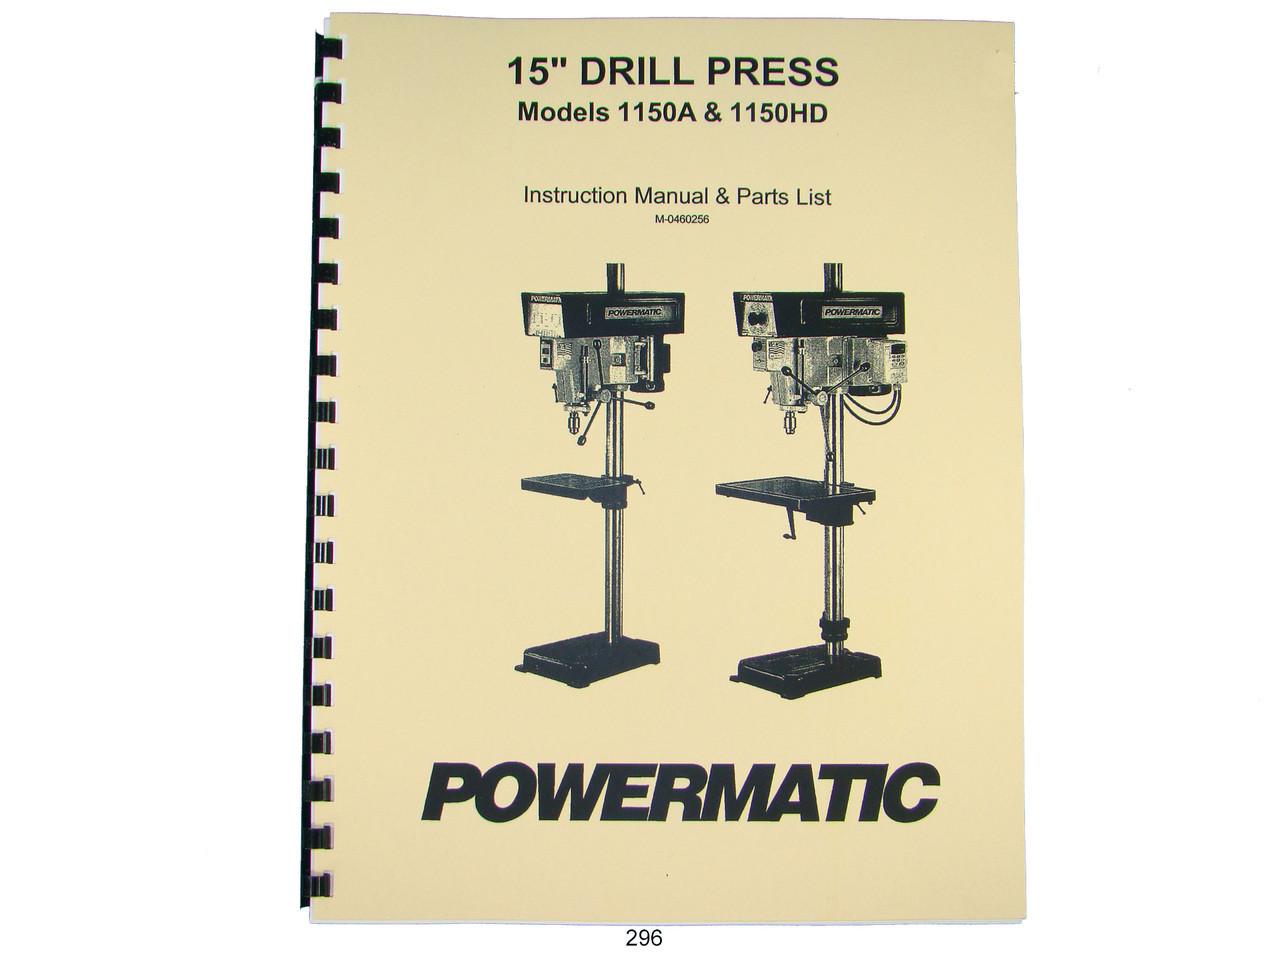 Powermatic 2800 Drill Press Parts